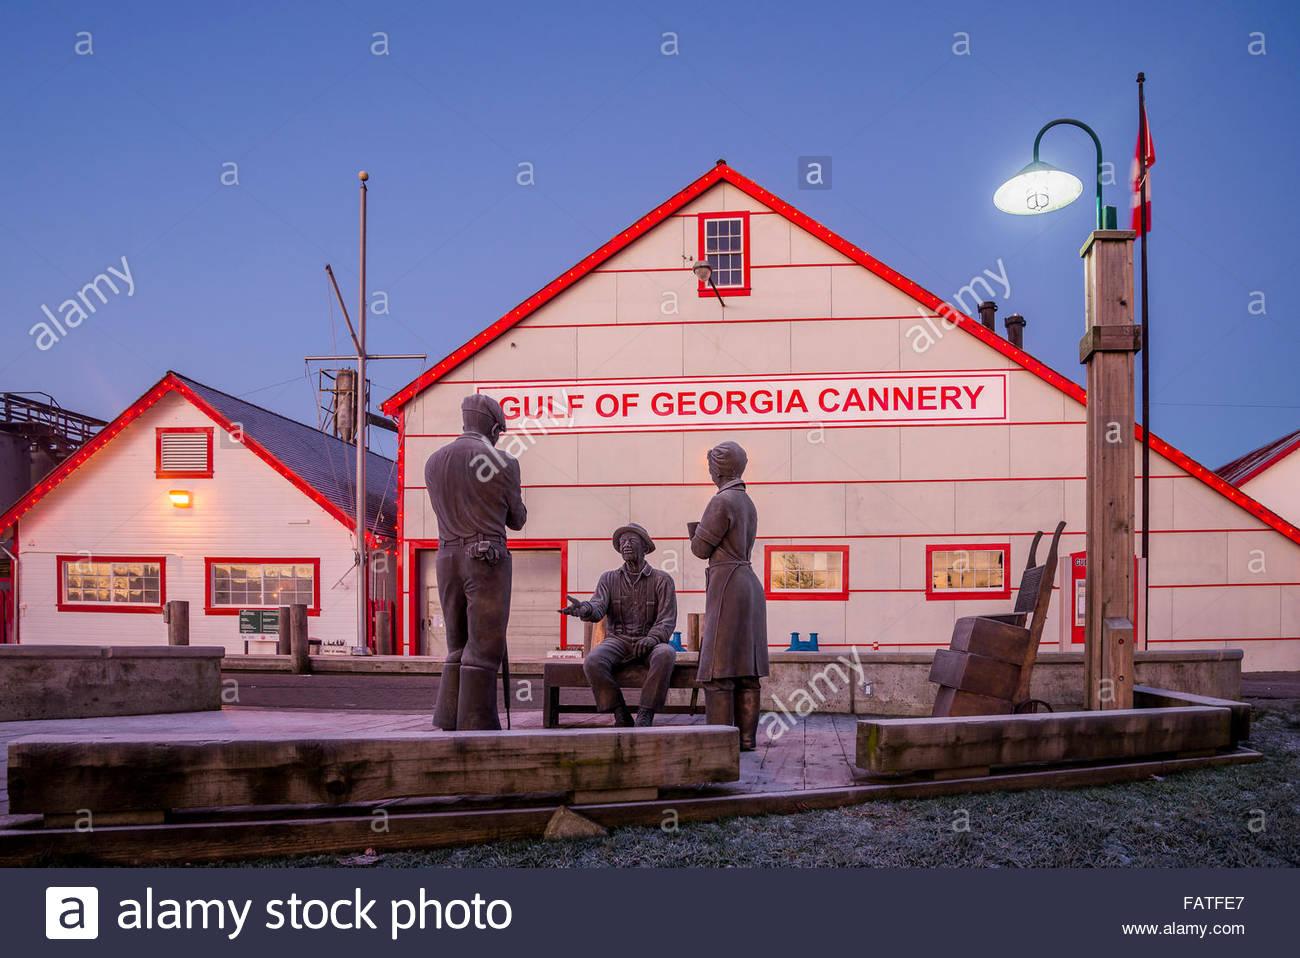 Gulf of Georgia Cannery, Steveston, Richmond, British Columbia, Canada - Stock Image